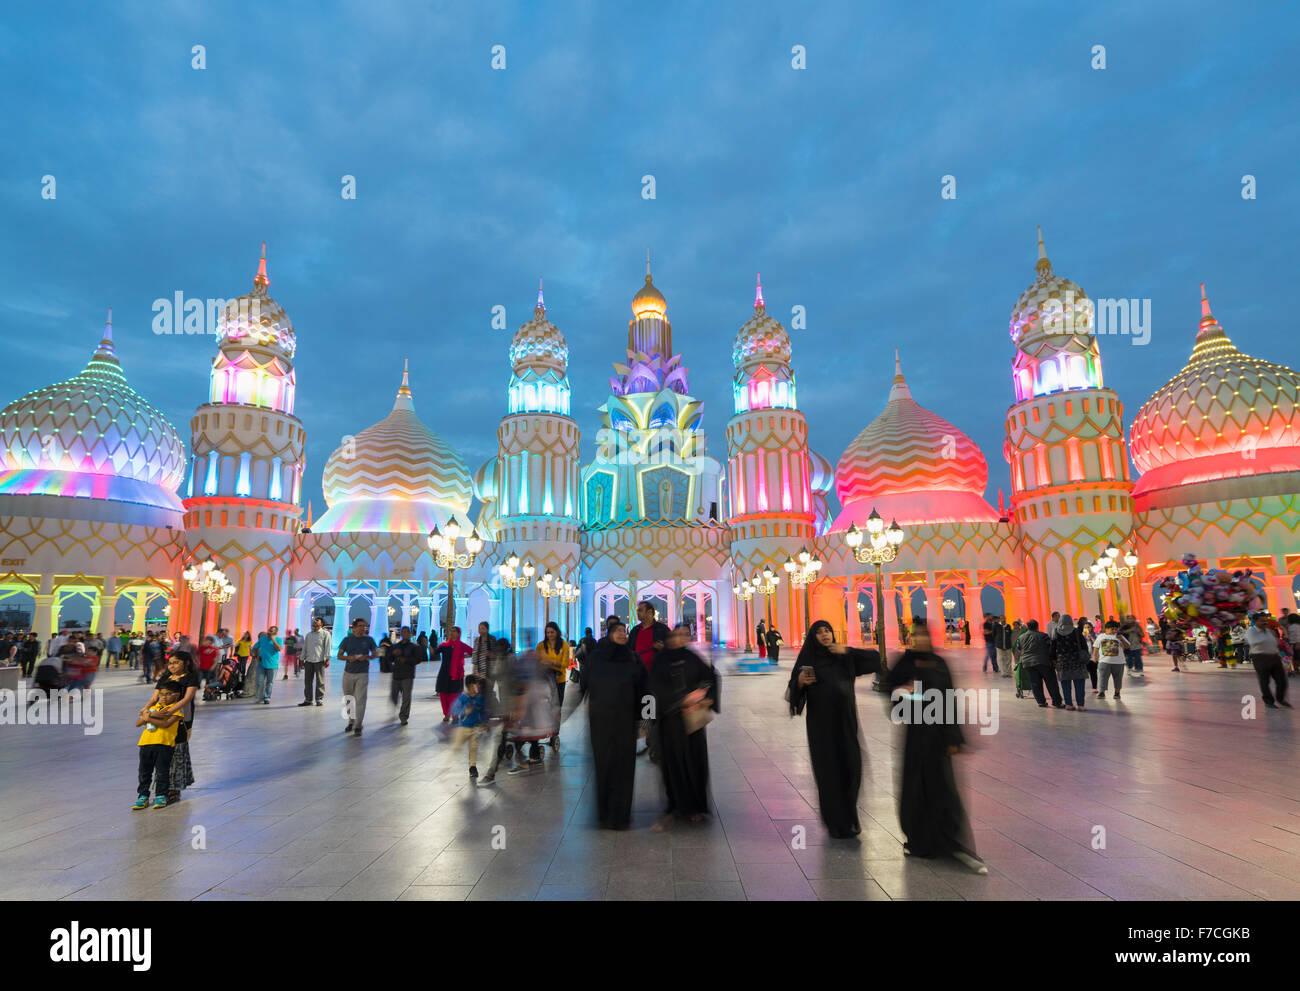 Evening view of illuminated Gate of the World at Global Village 2015 in Dubai United Arab Emirates - Stock Image